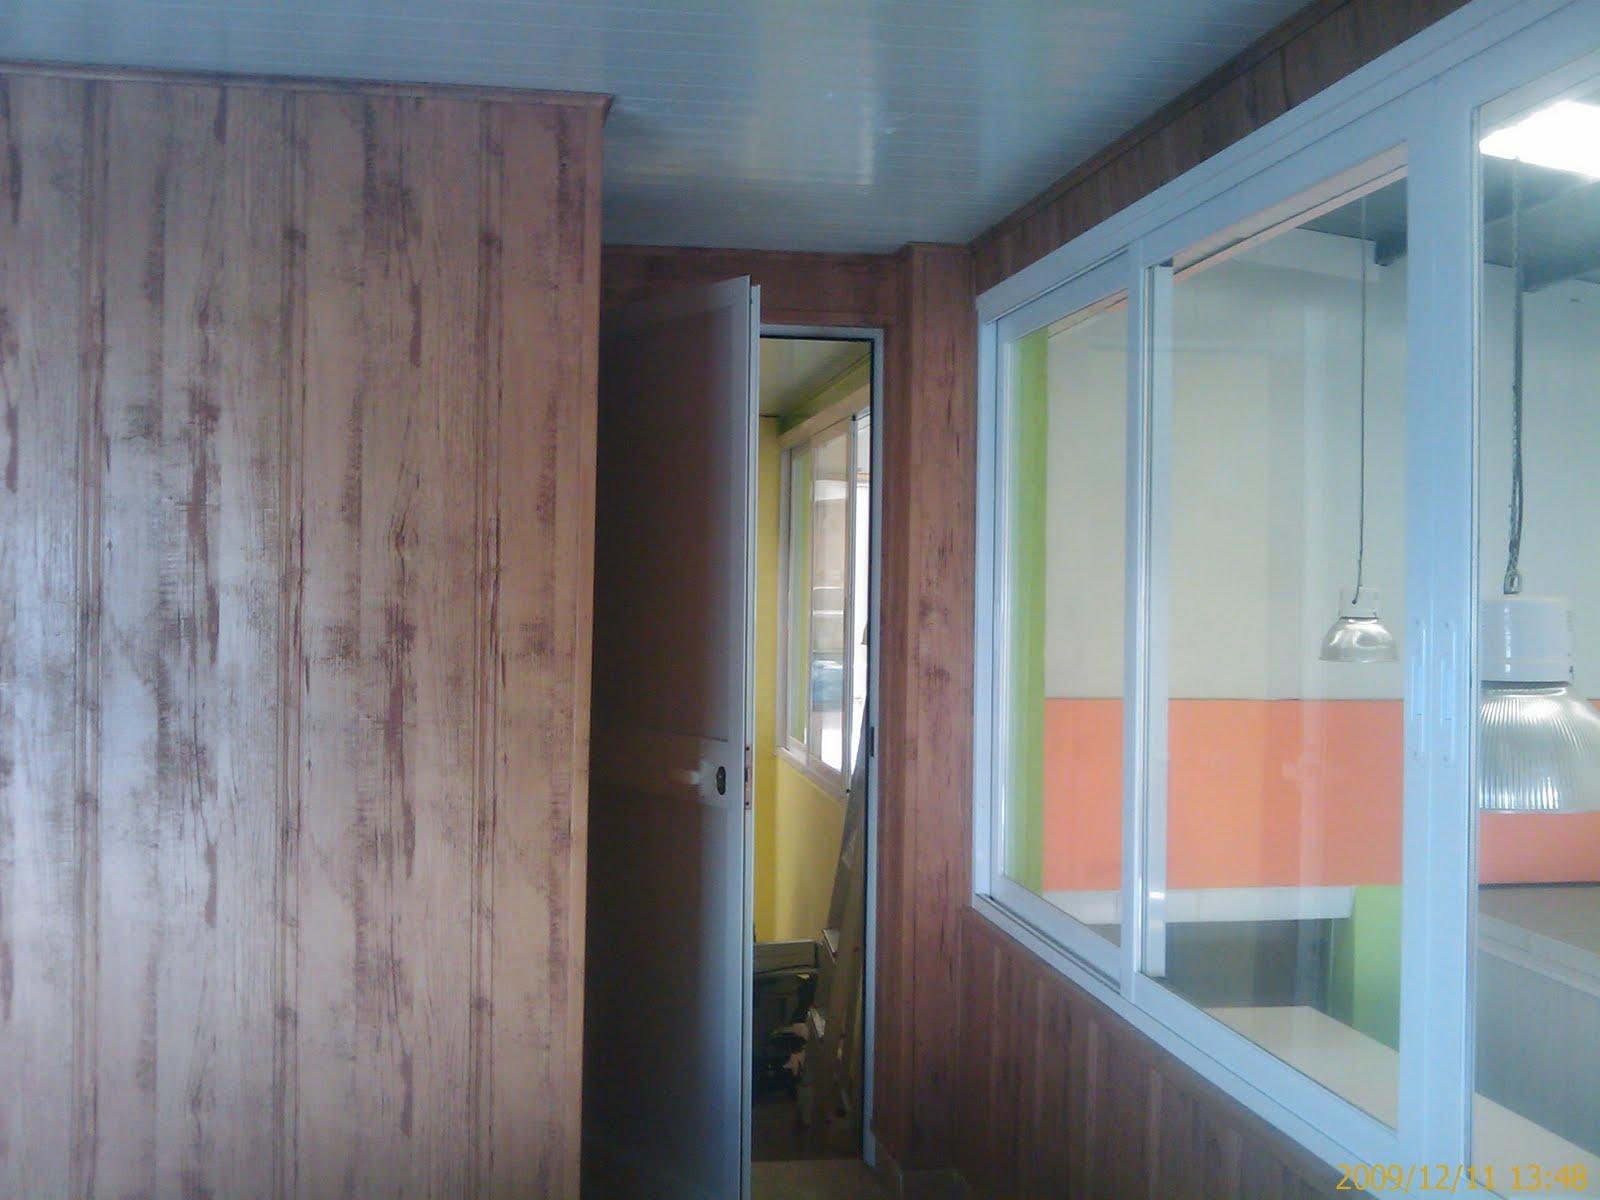 Carpinteria sarria aluminio puertas ventanas for Puertas para cerramientos